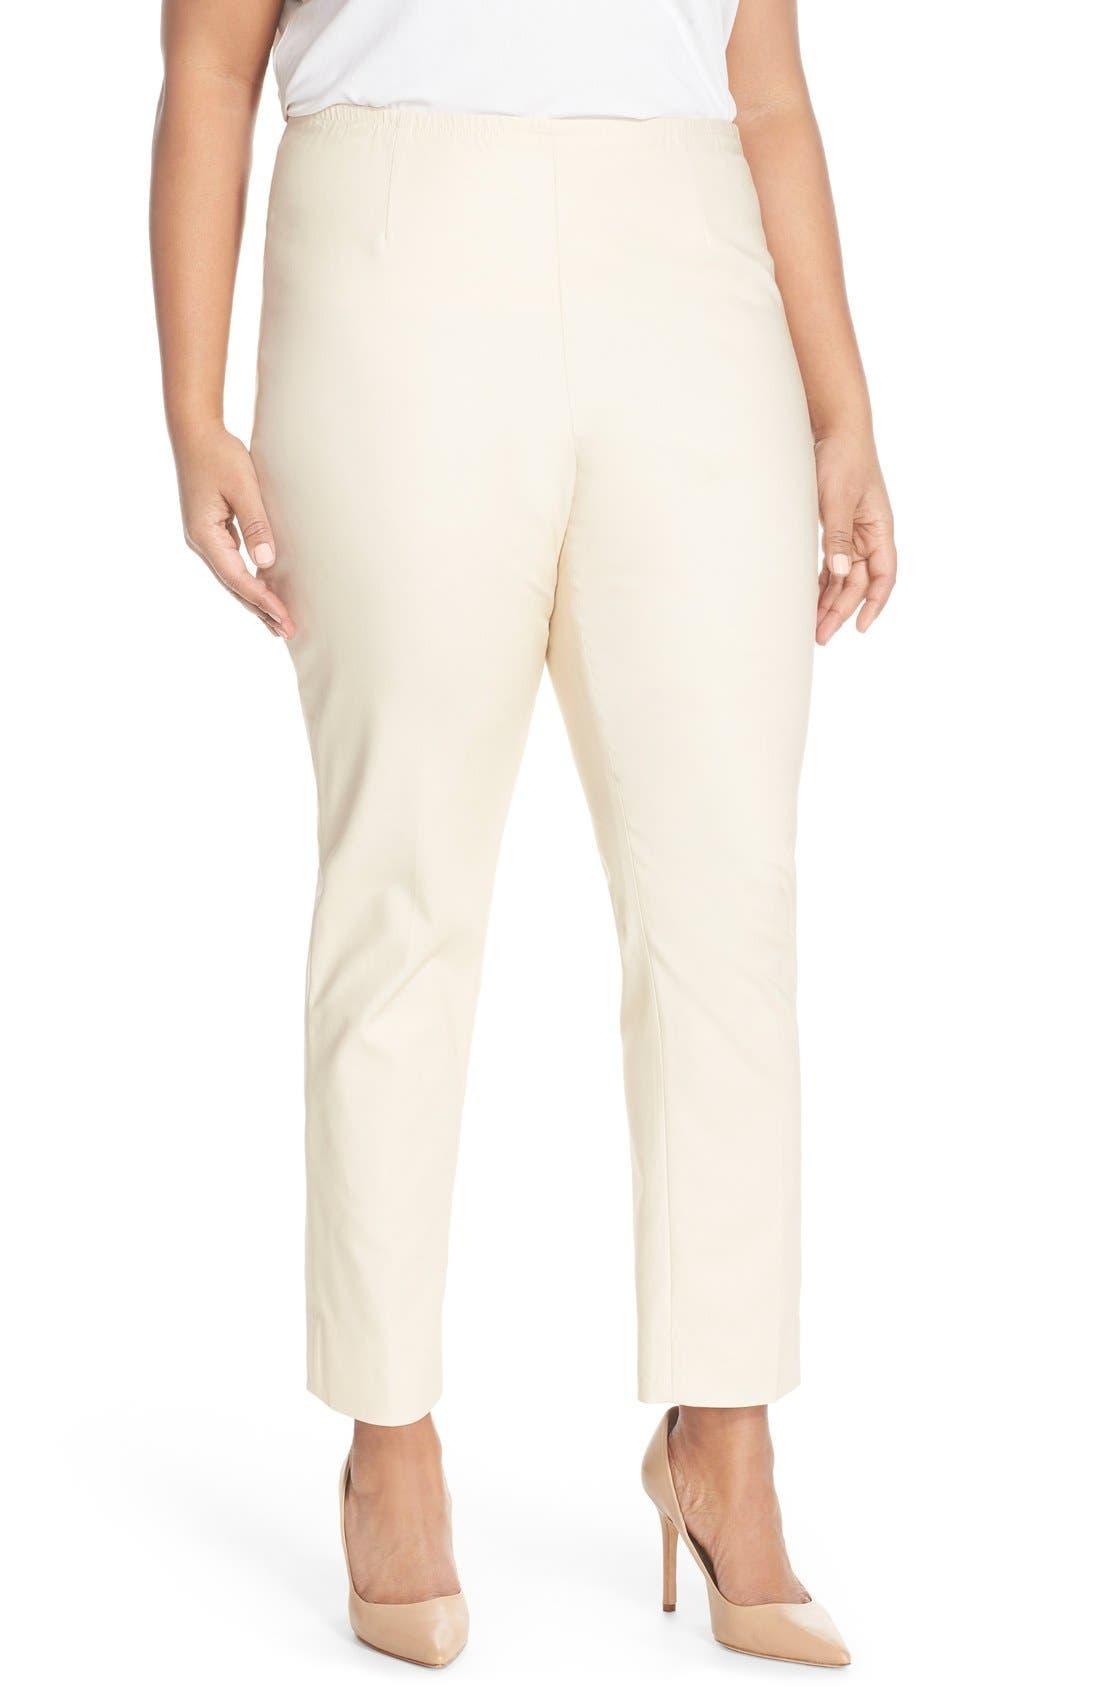 'Perfect' High Rise Side Zip Pants,                             Main thumbnail 1, color,                             SANDSHELL